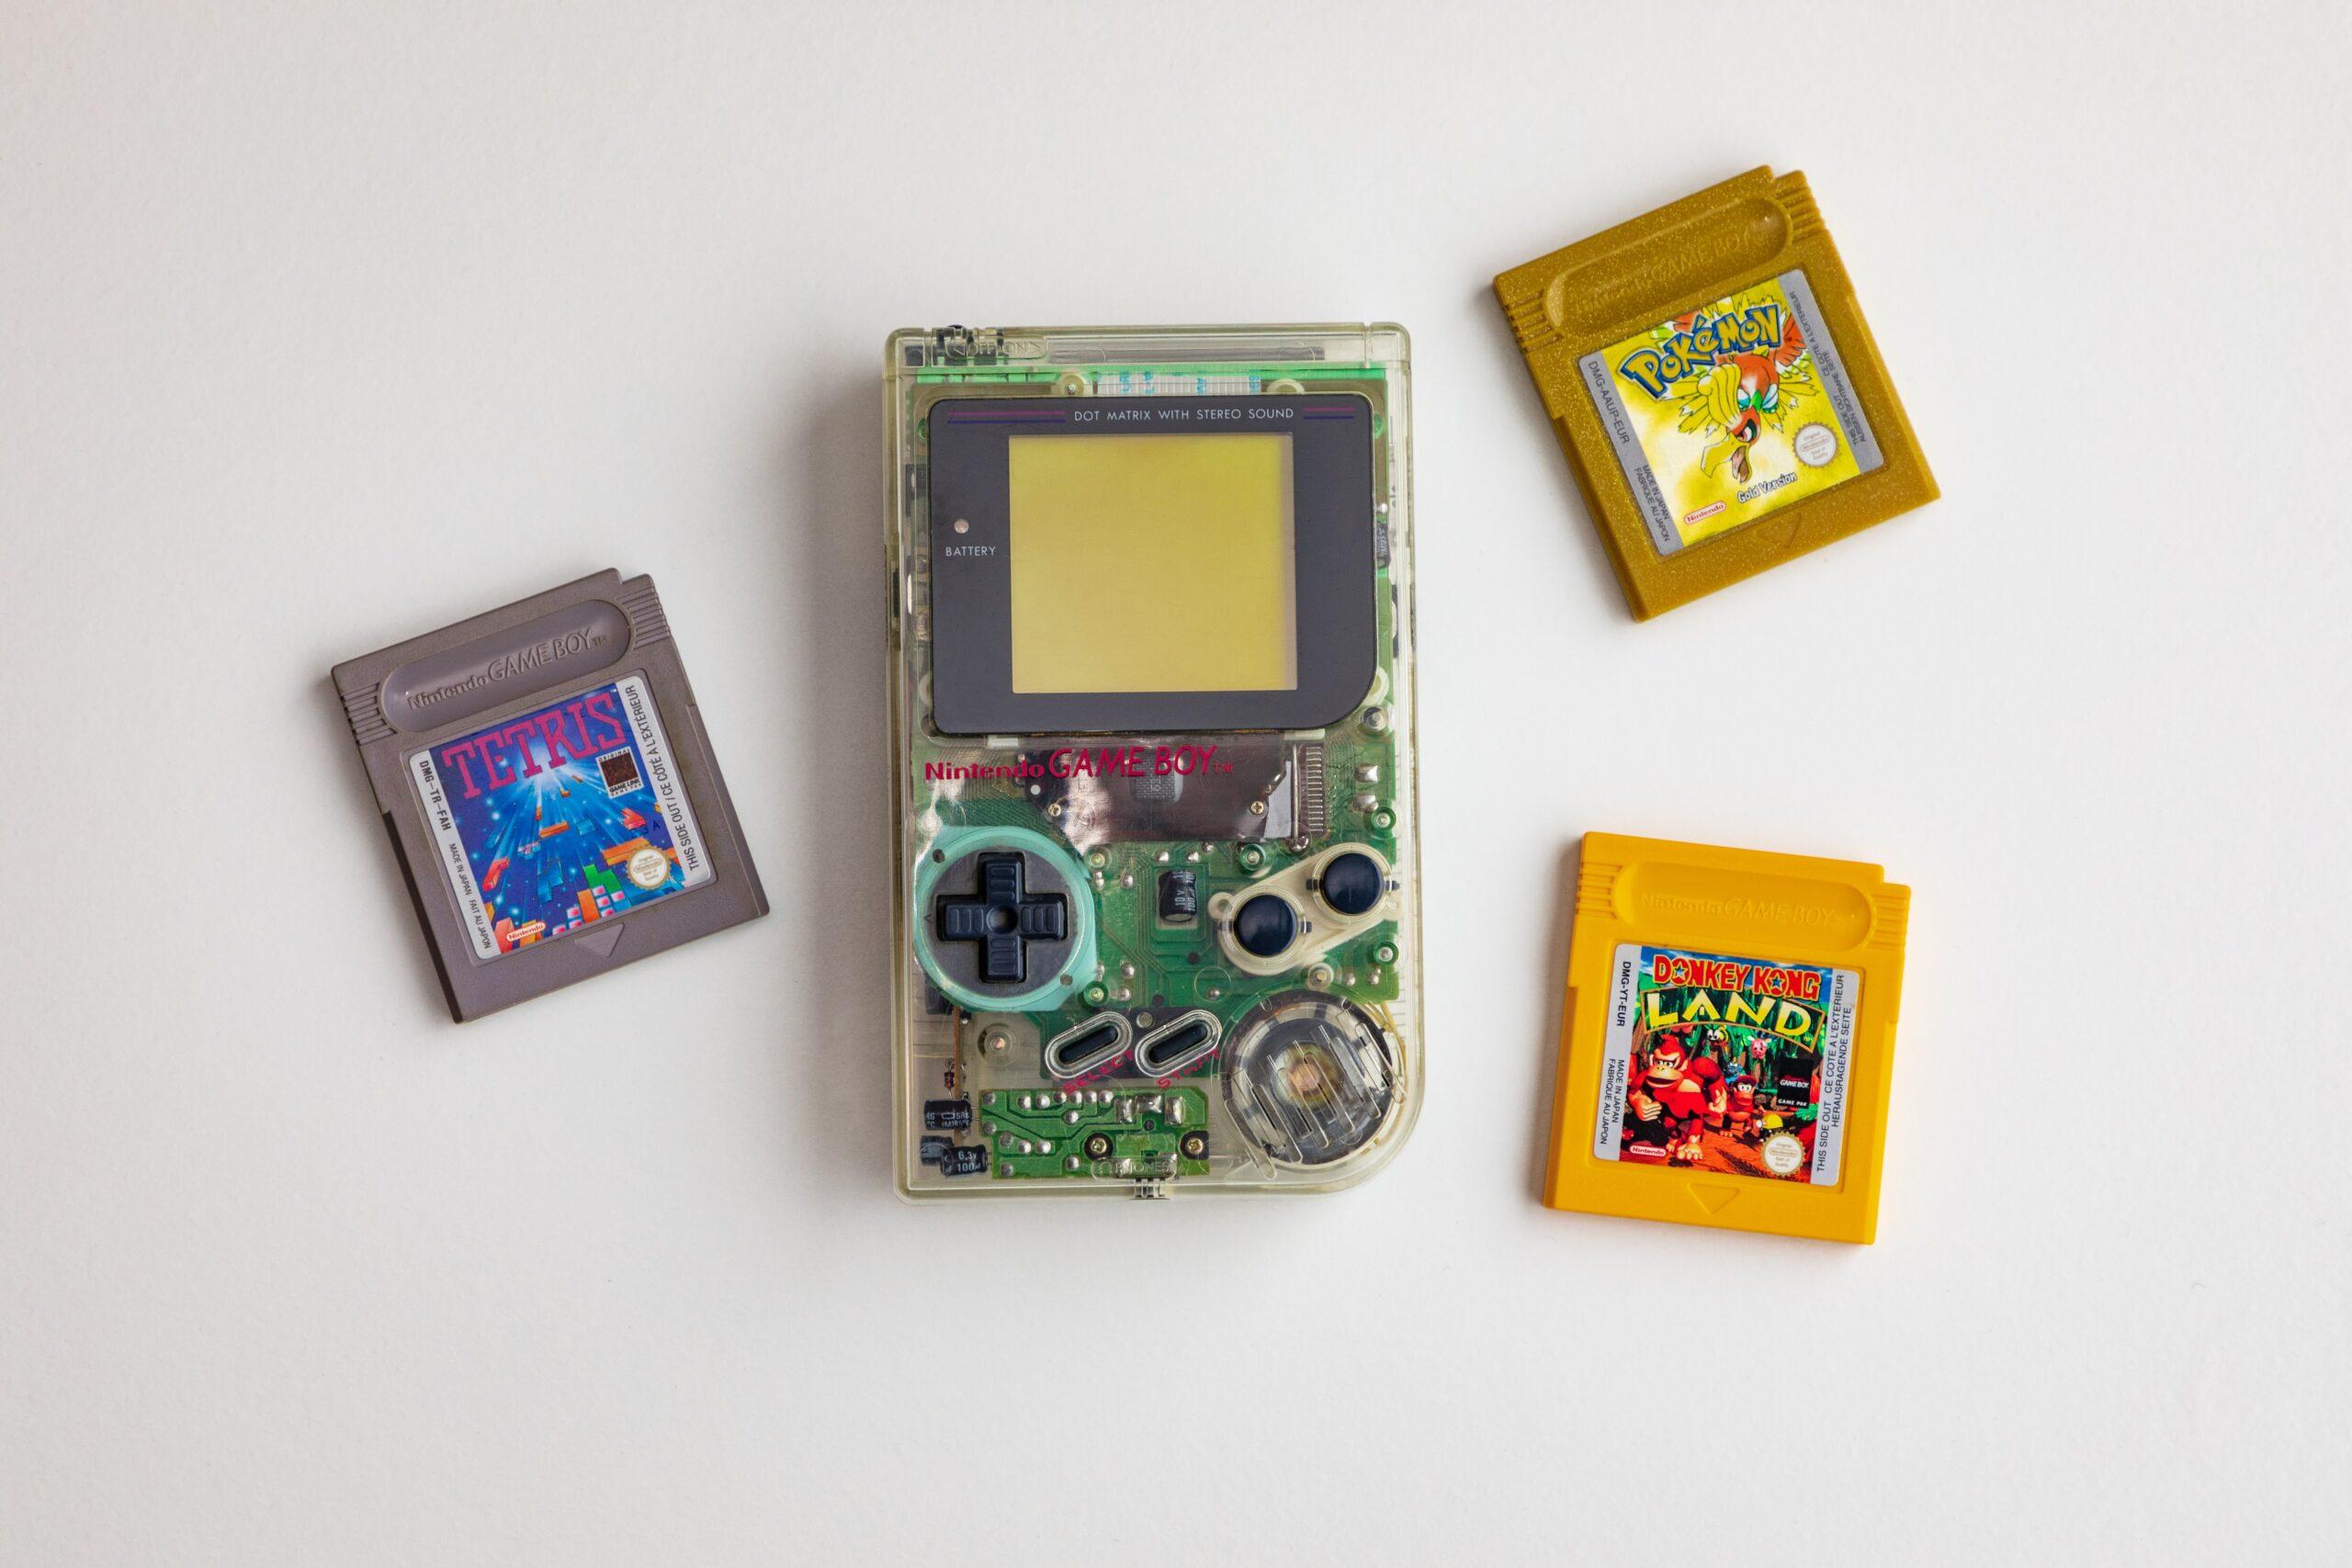 Zeldzame spelcomputers